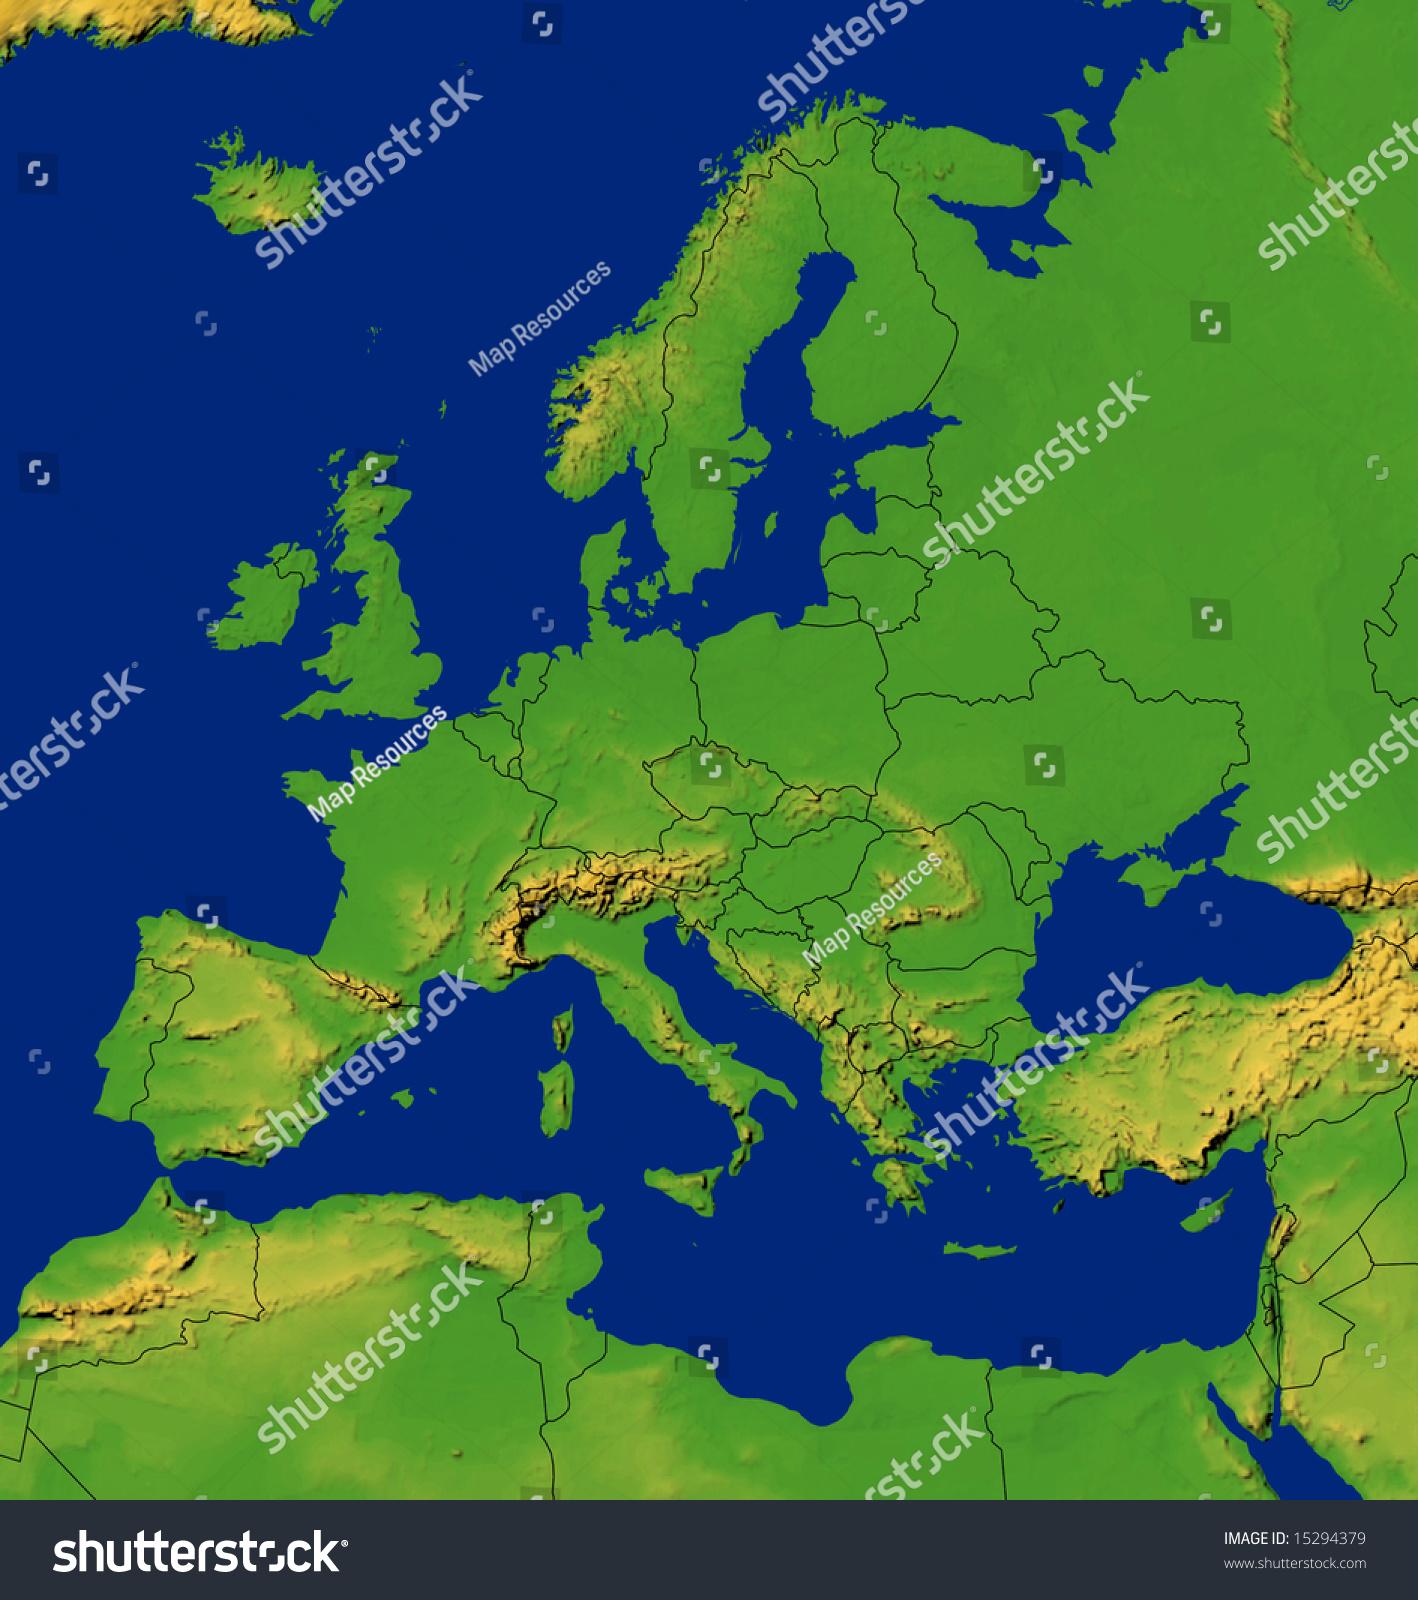 Europe Map Terrain Stock Illustration Shutterstock - Europe terrain map